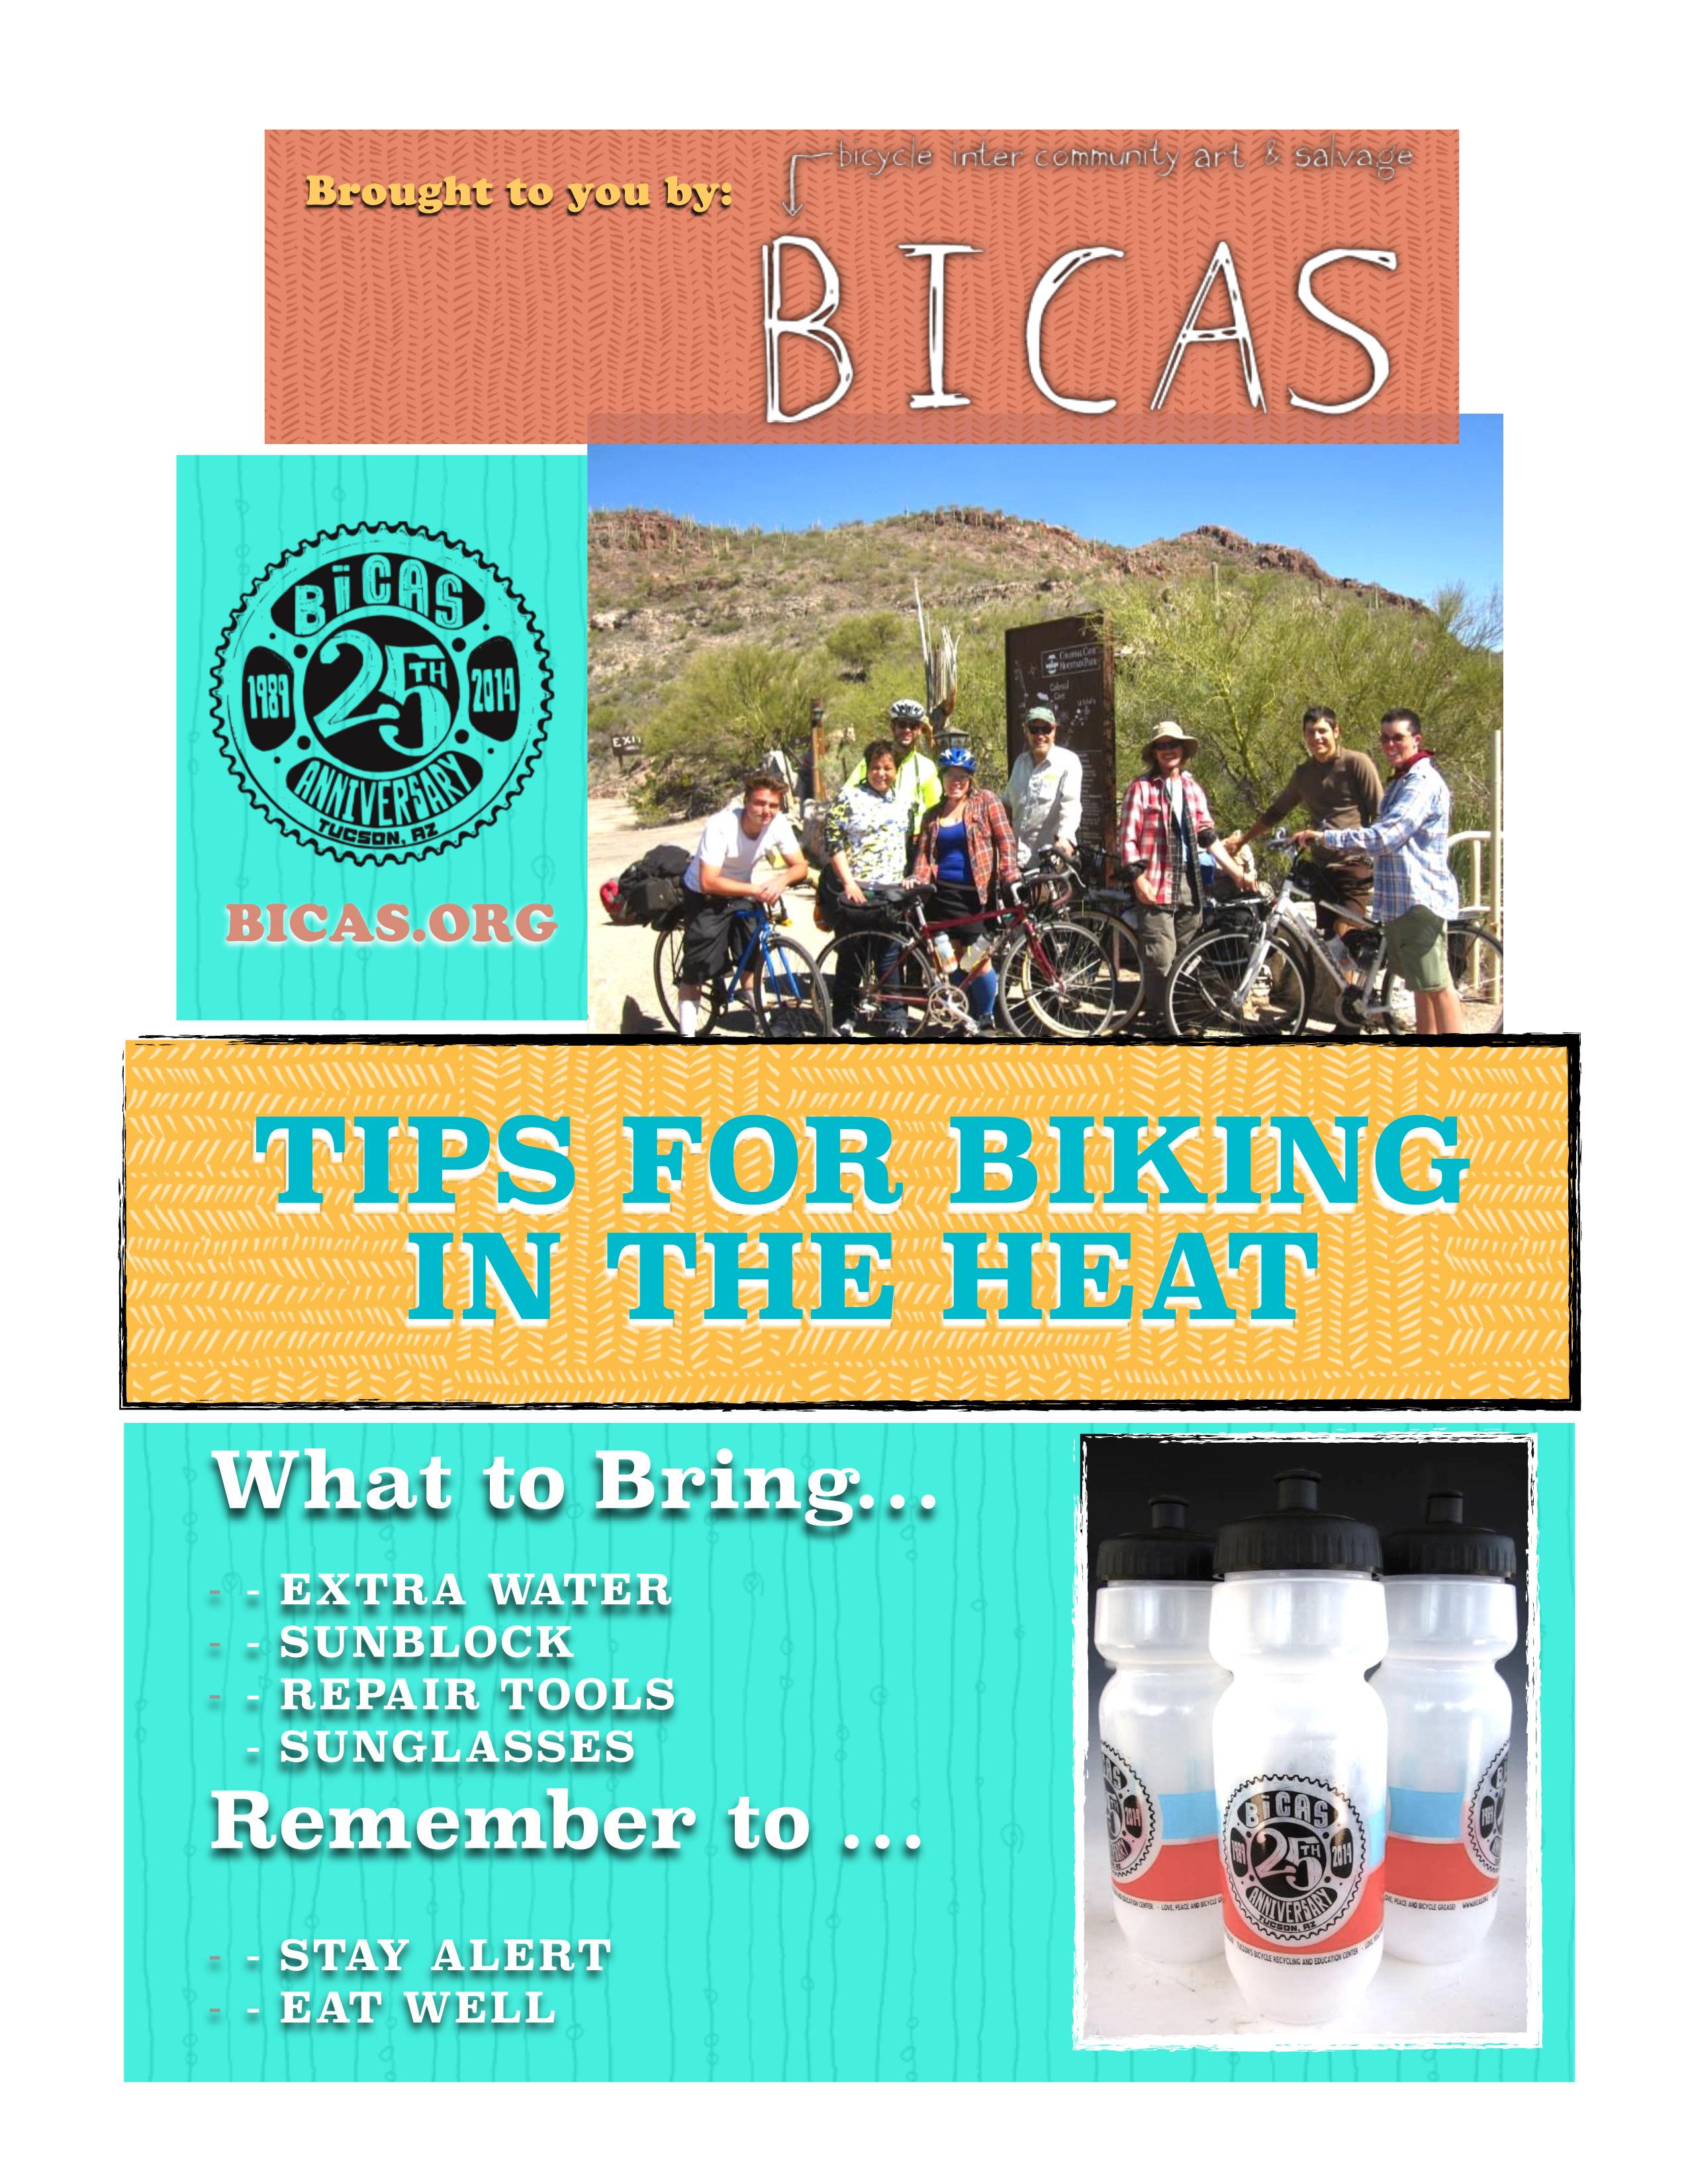 Tips for Biking in the Heat